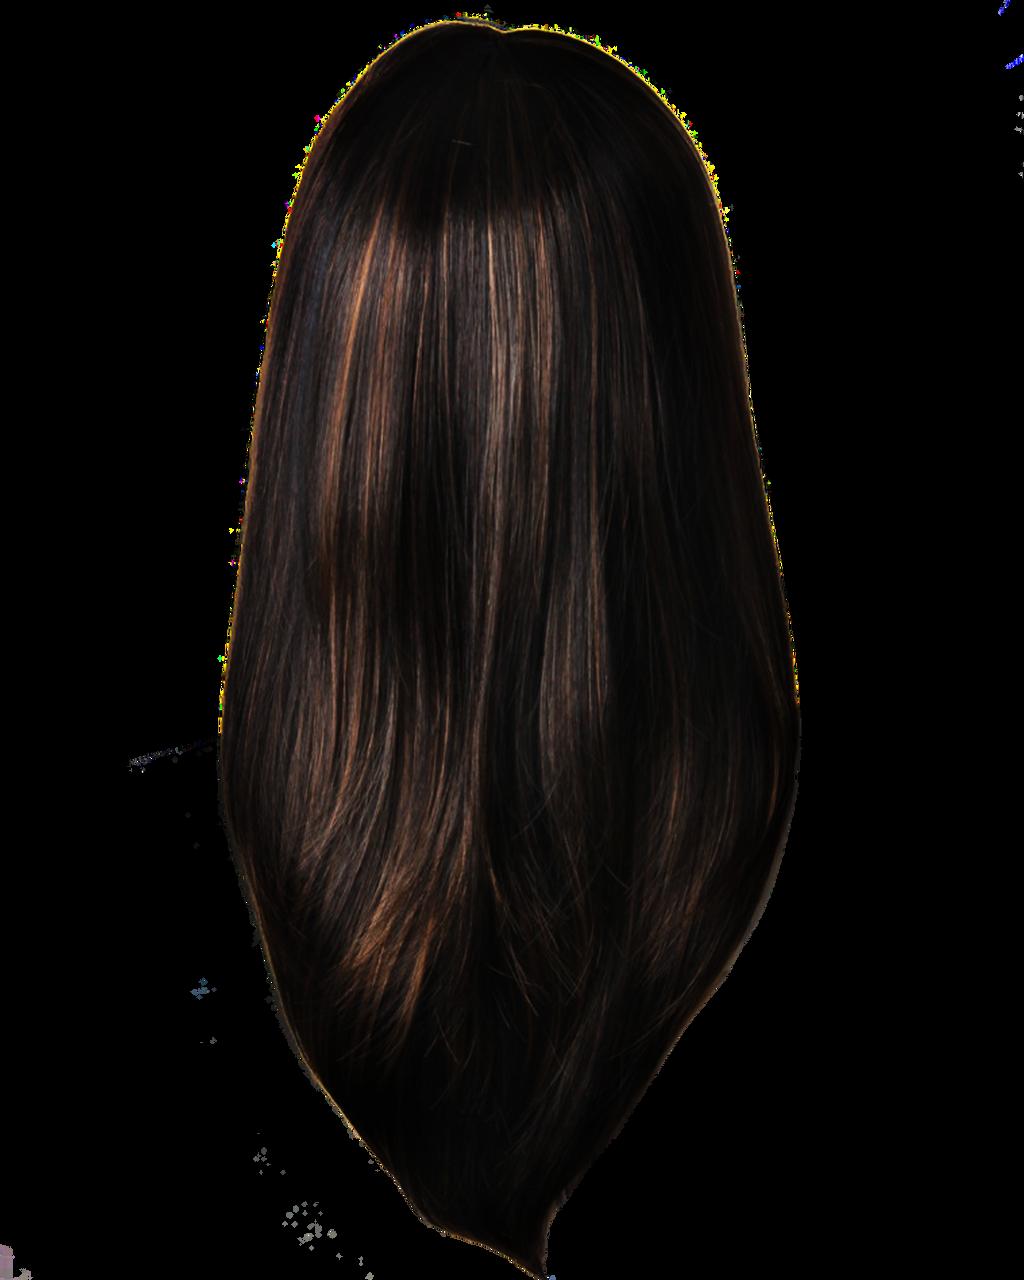 hair png - photo #14